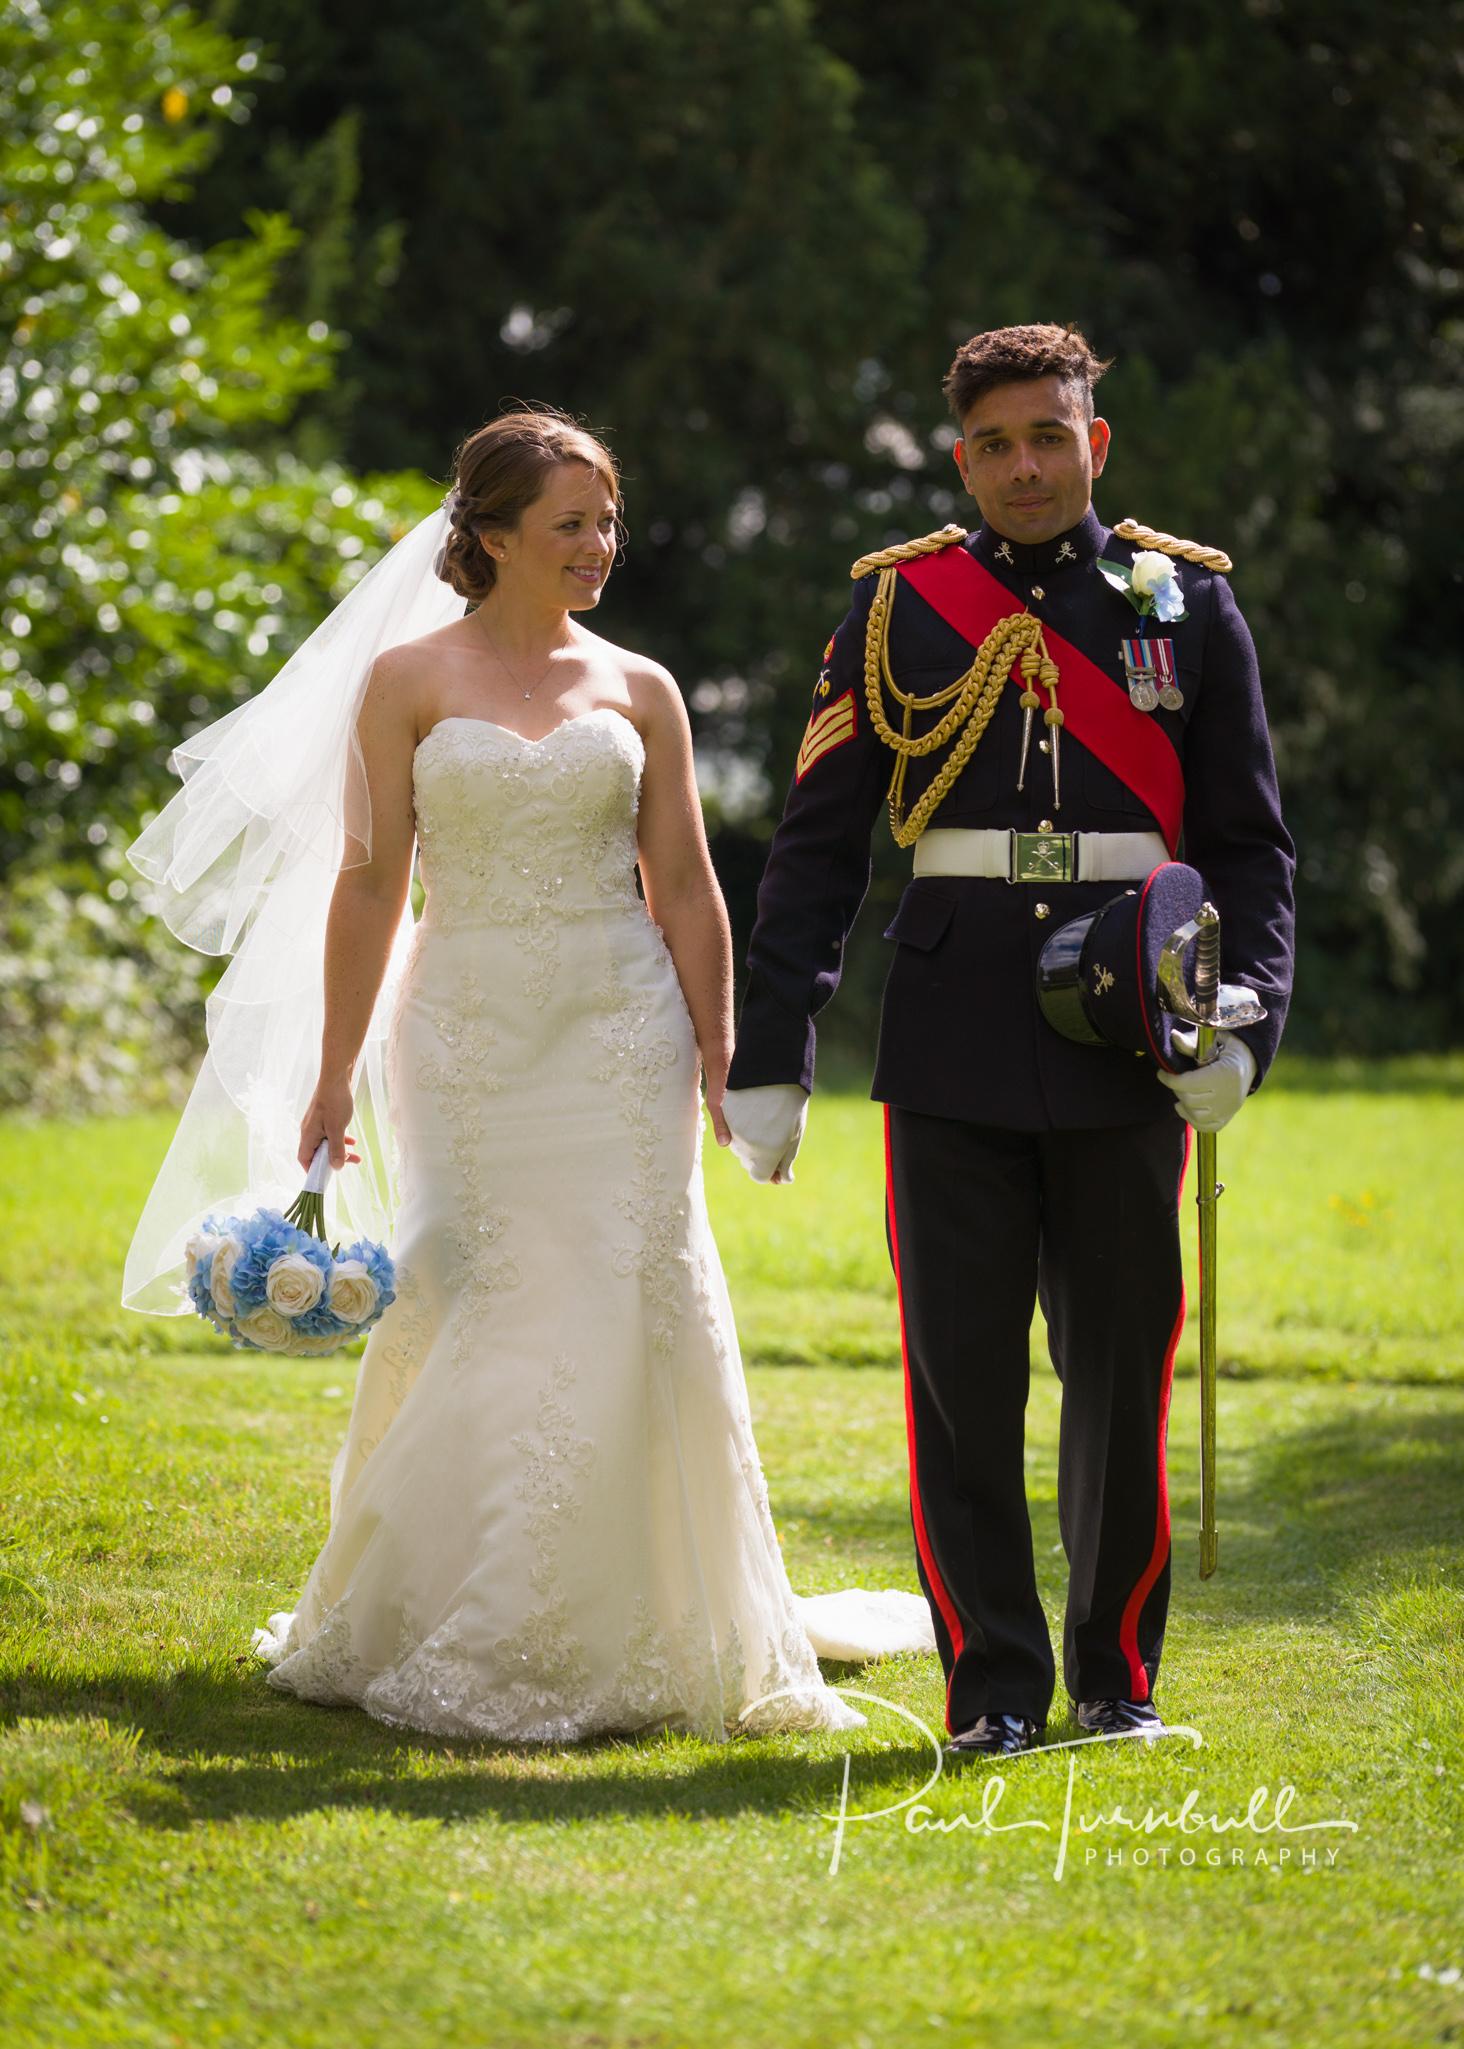 wedding-photographer-south-dalton-walkington-yorkshire-emma-james-041.jpg